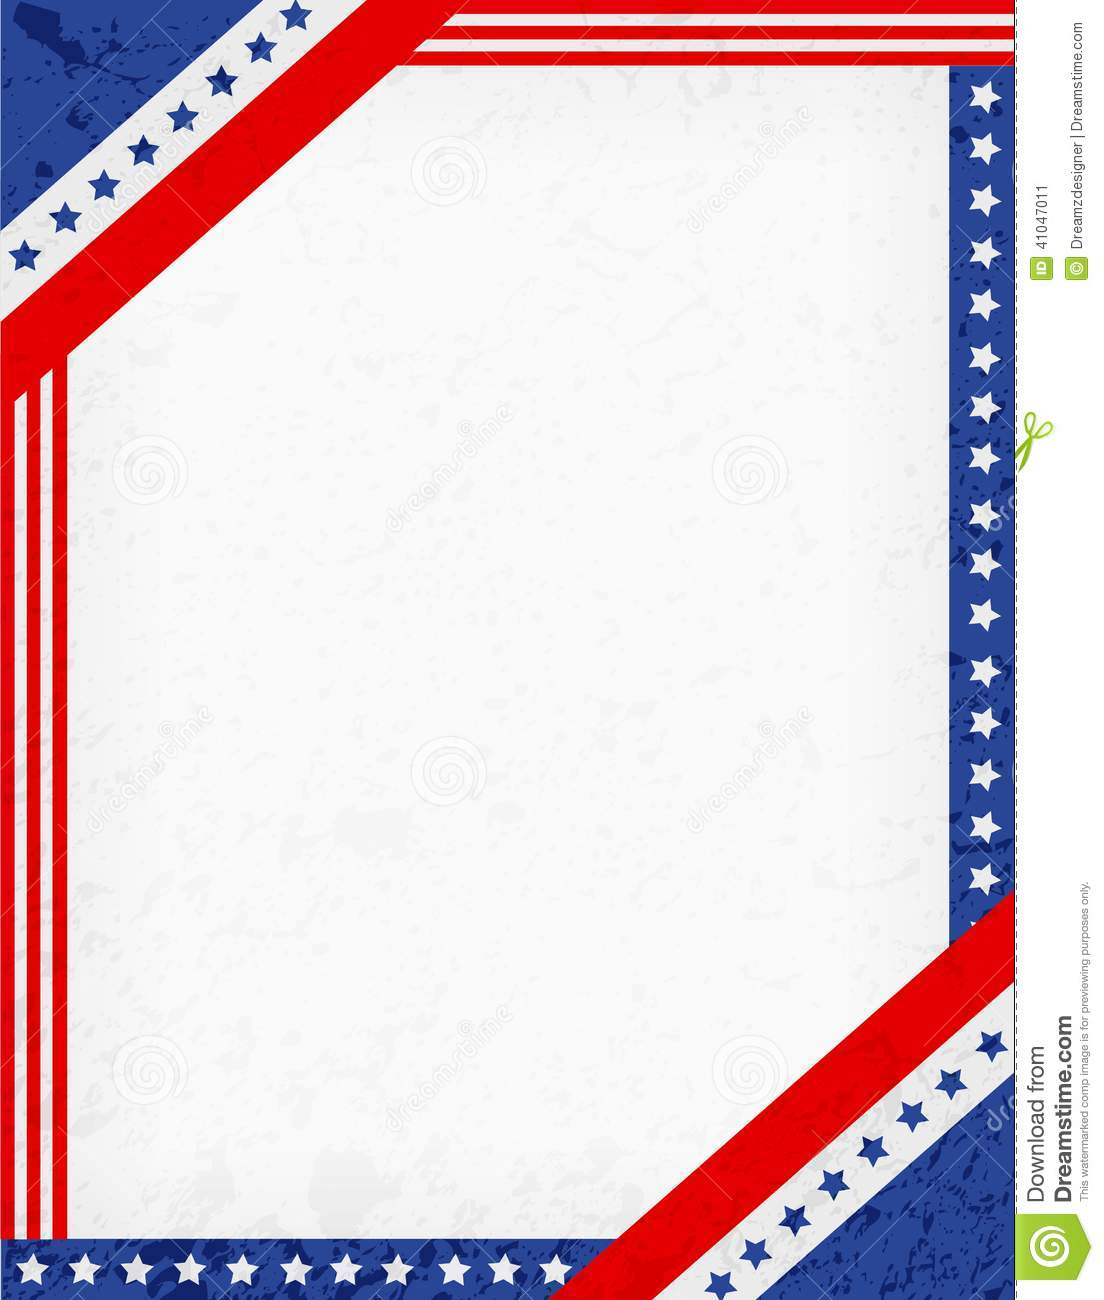 patriotic-star-border-clip-art-patriotic-border-red-blue-american-flag    Vintage American Flag Border Clip Art